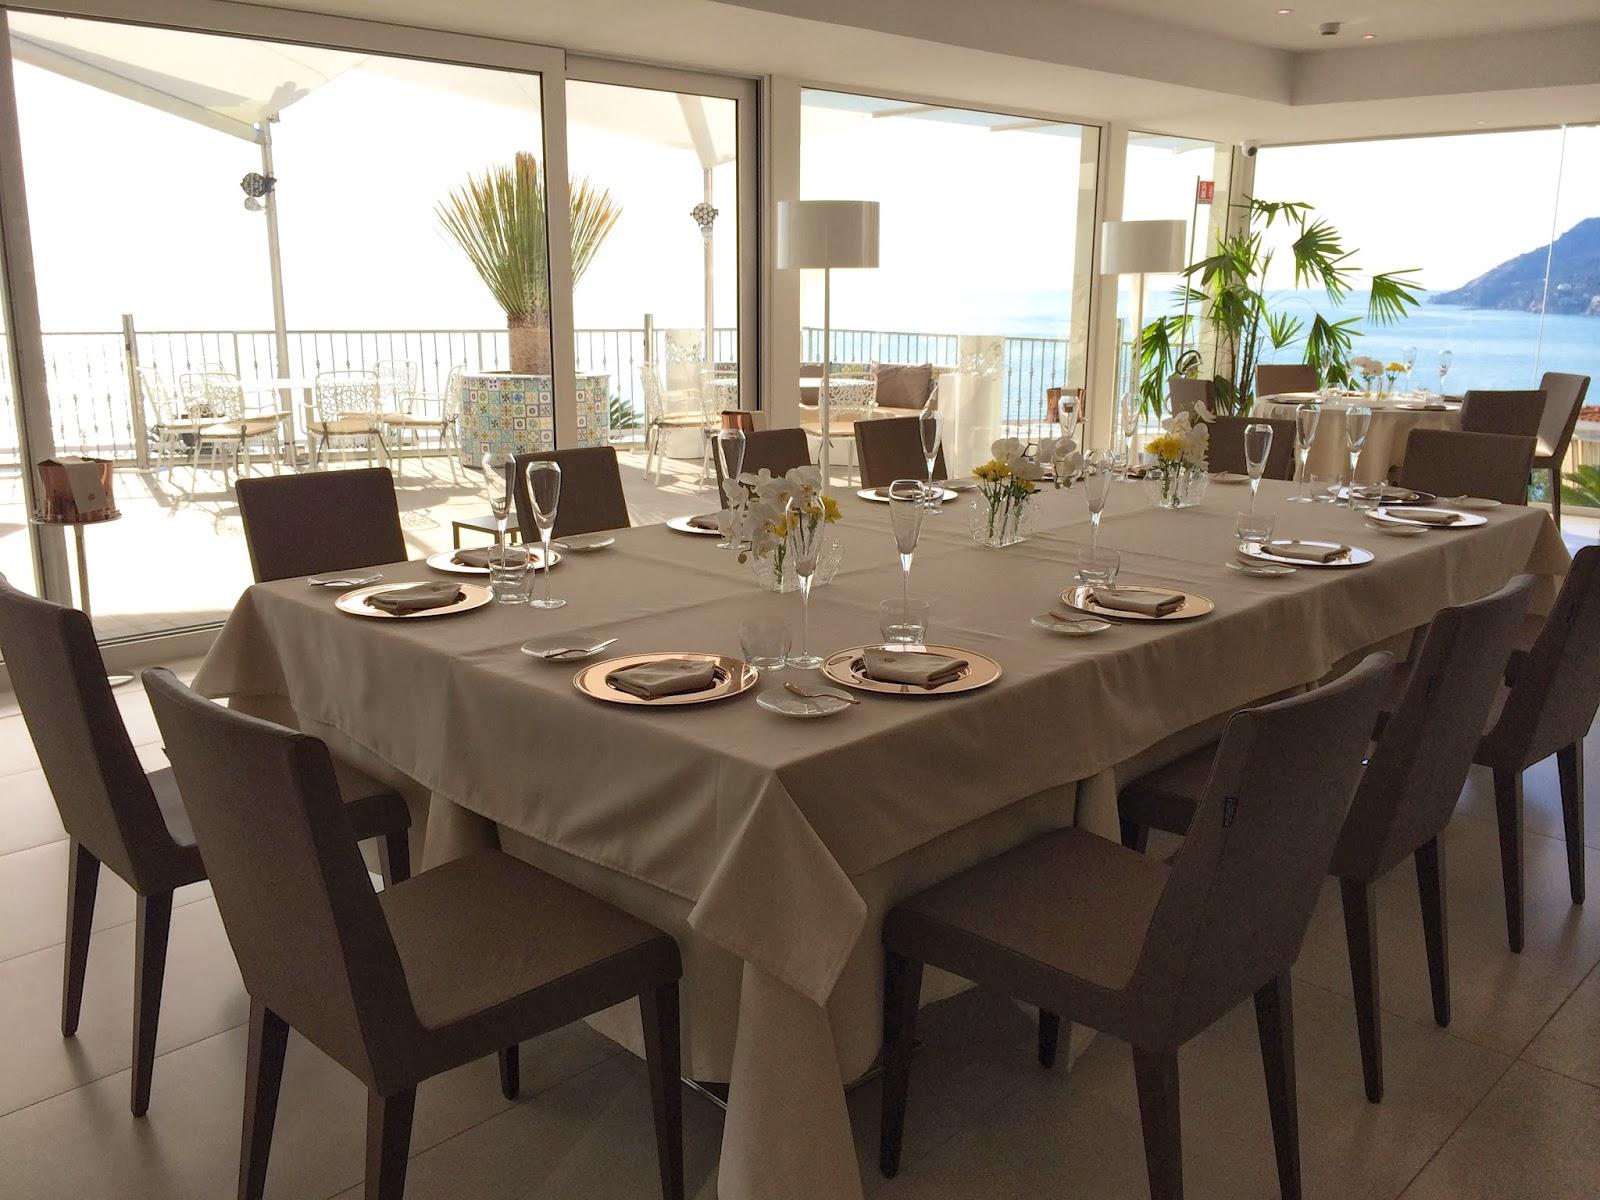 Restaurant_Re_Maurì_Lloyd's_Baia_Hotel_Vietri_su_ Mare_Salerno_Amalfi_Coast_Chef_Oliver_Glowig_Chef_Lorenzo_Cuomo